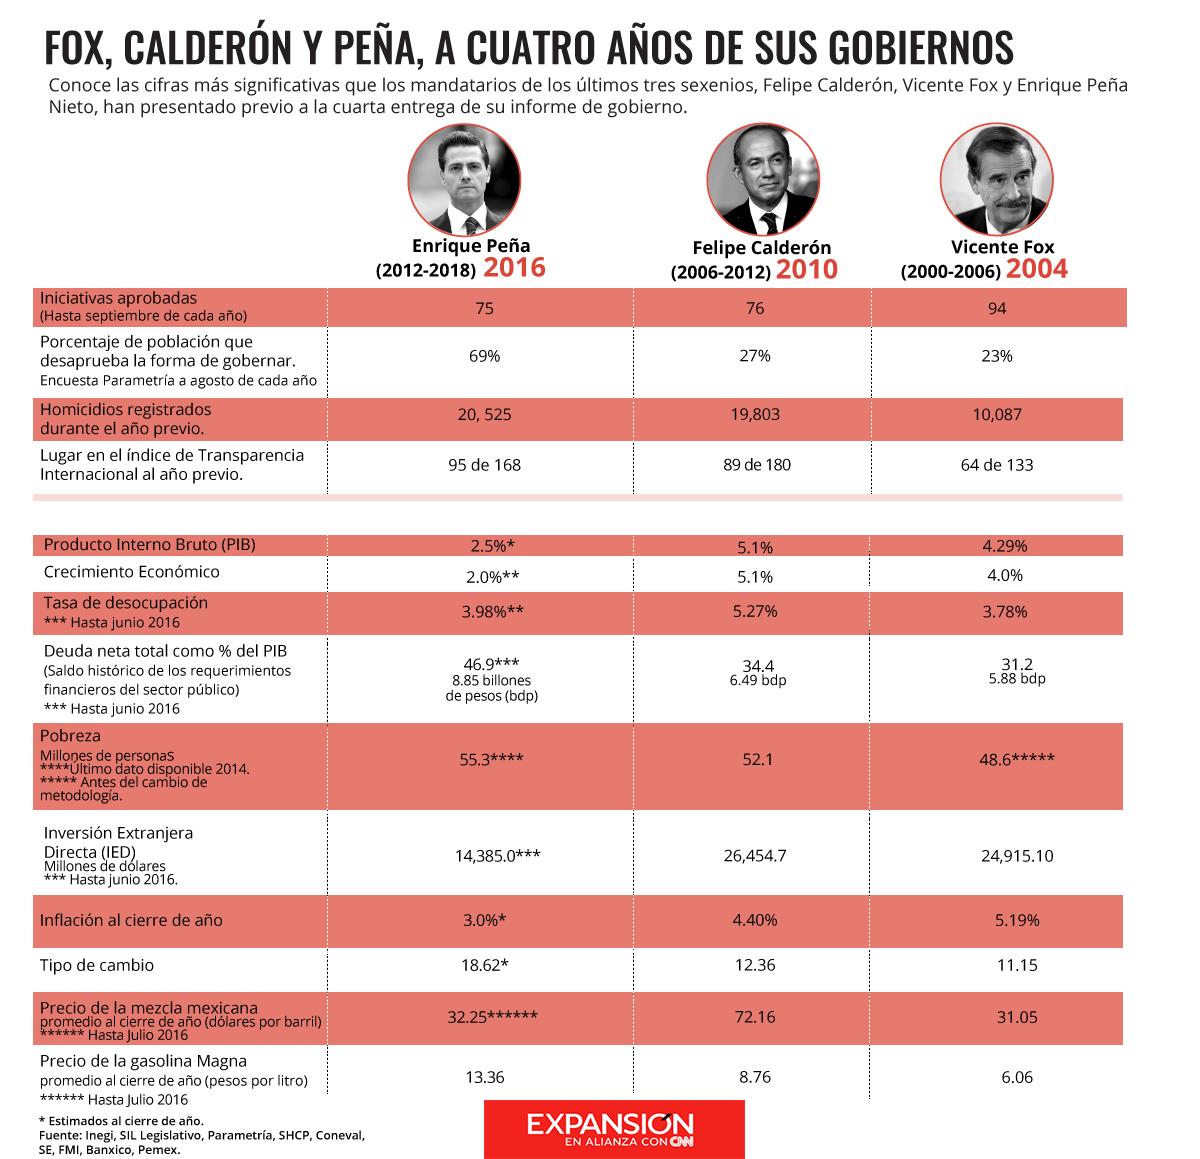 expansion-pena-nieto-calderon-fox